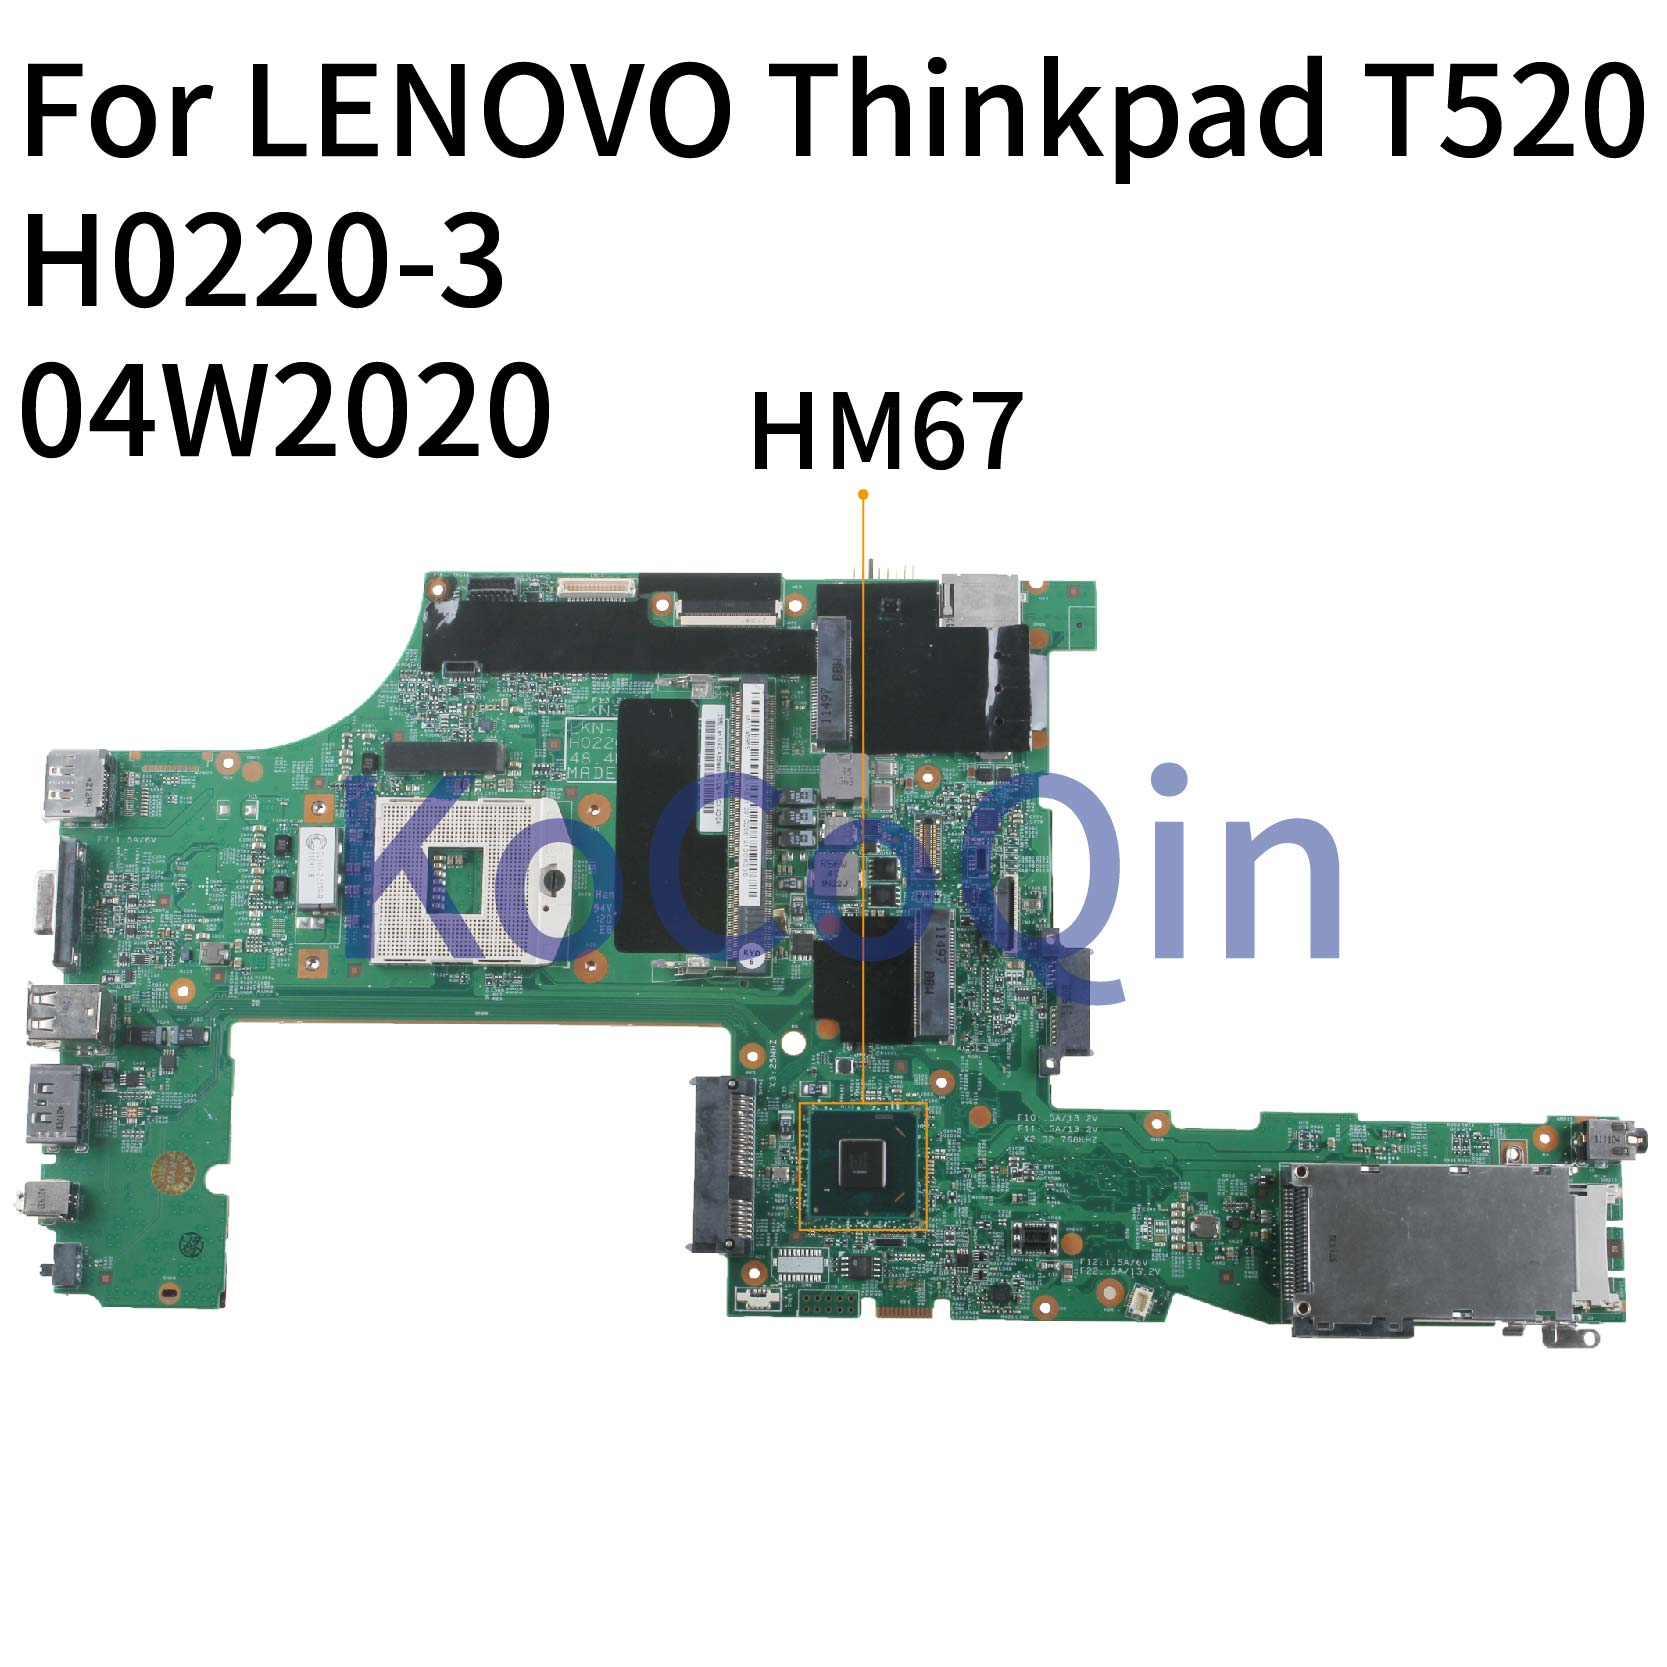 KoCoQin اللوحة الأم لأجهزة الكمبيوتر المحمول لينوفو ثينك باد T520 04W2020 H0220-3 48.4KE34.011 HM67